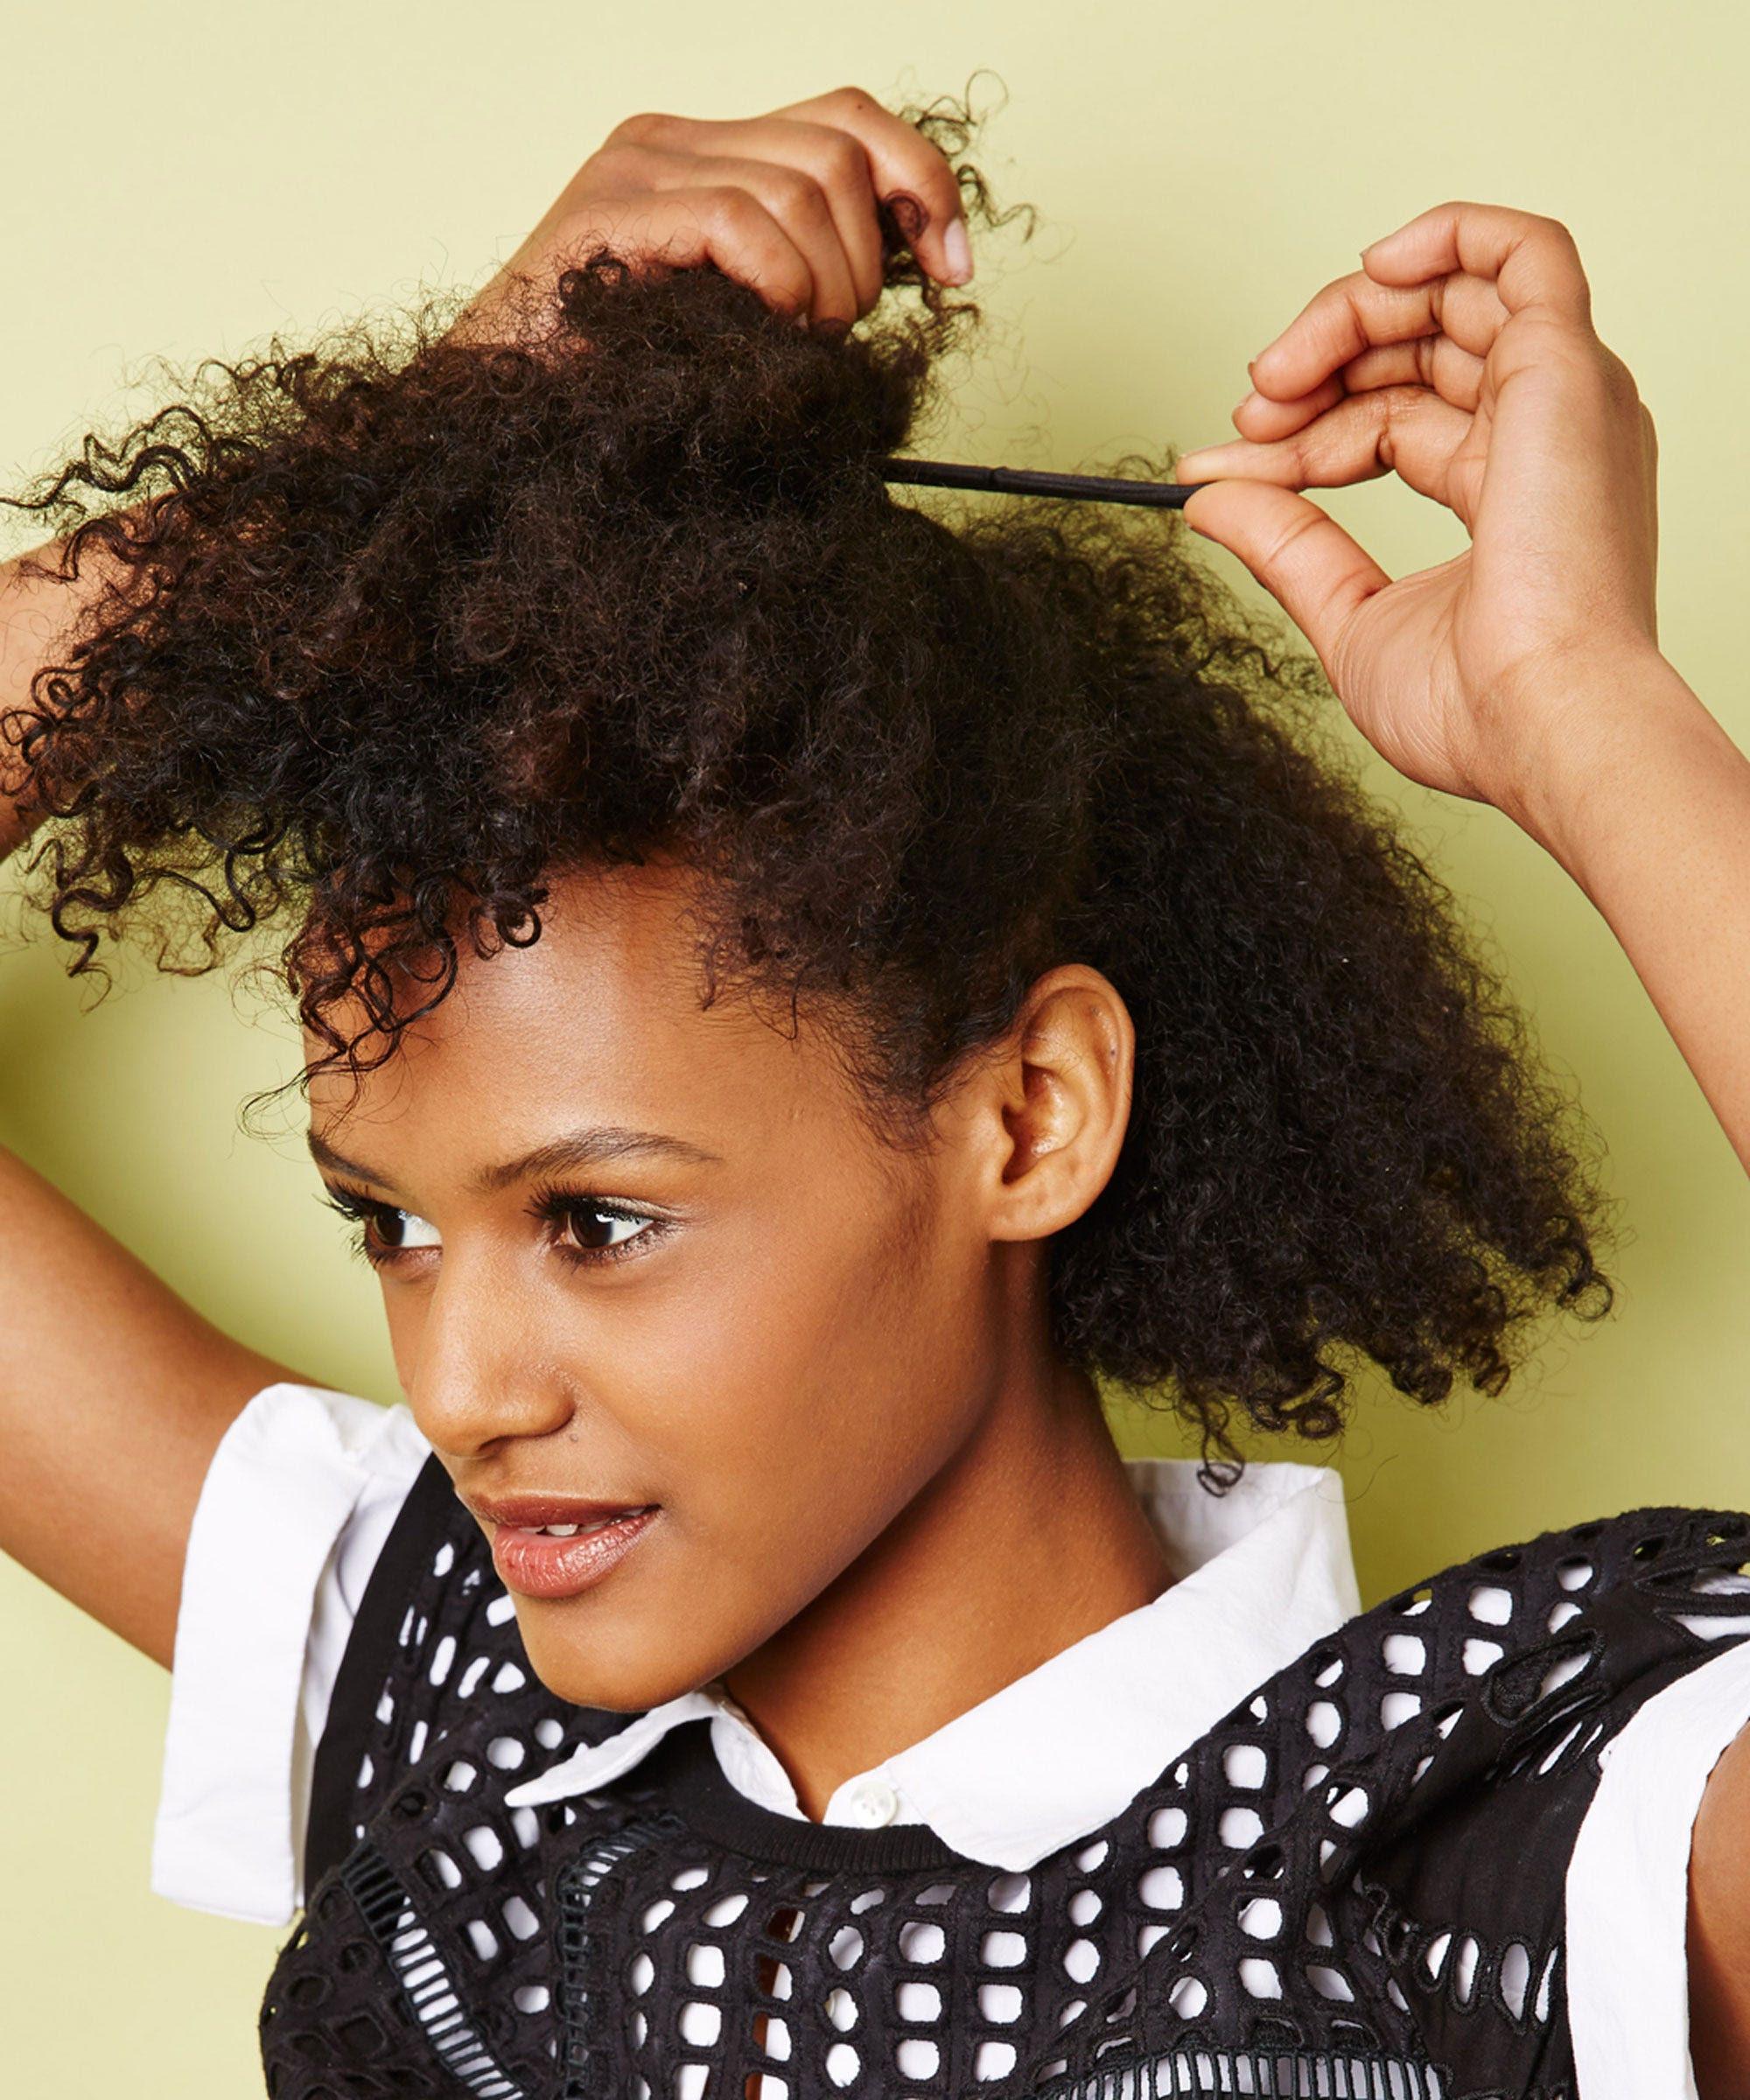 Natural Hair Styles Black Hair Tips intended for Natural Hair Styles Pictures Black Hair